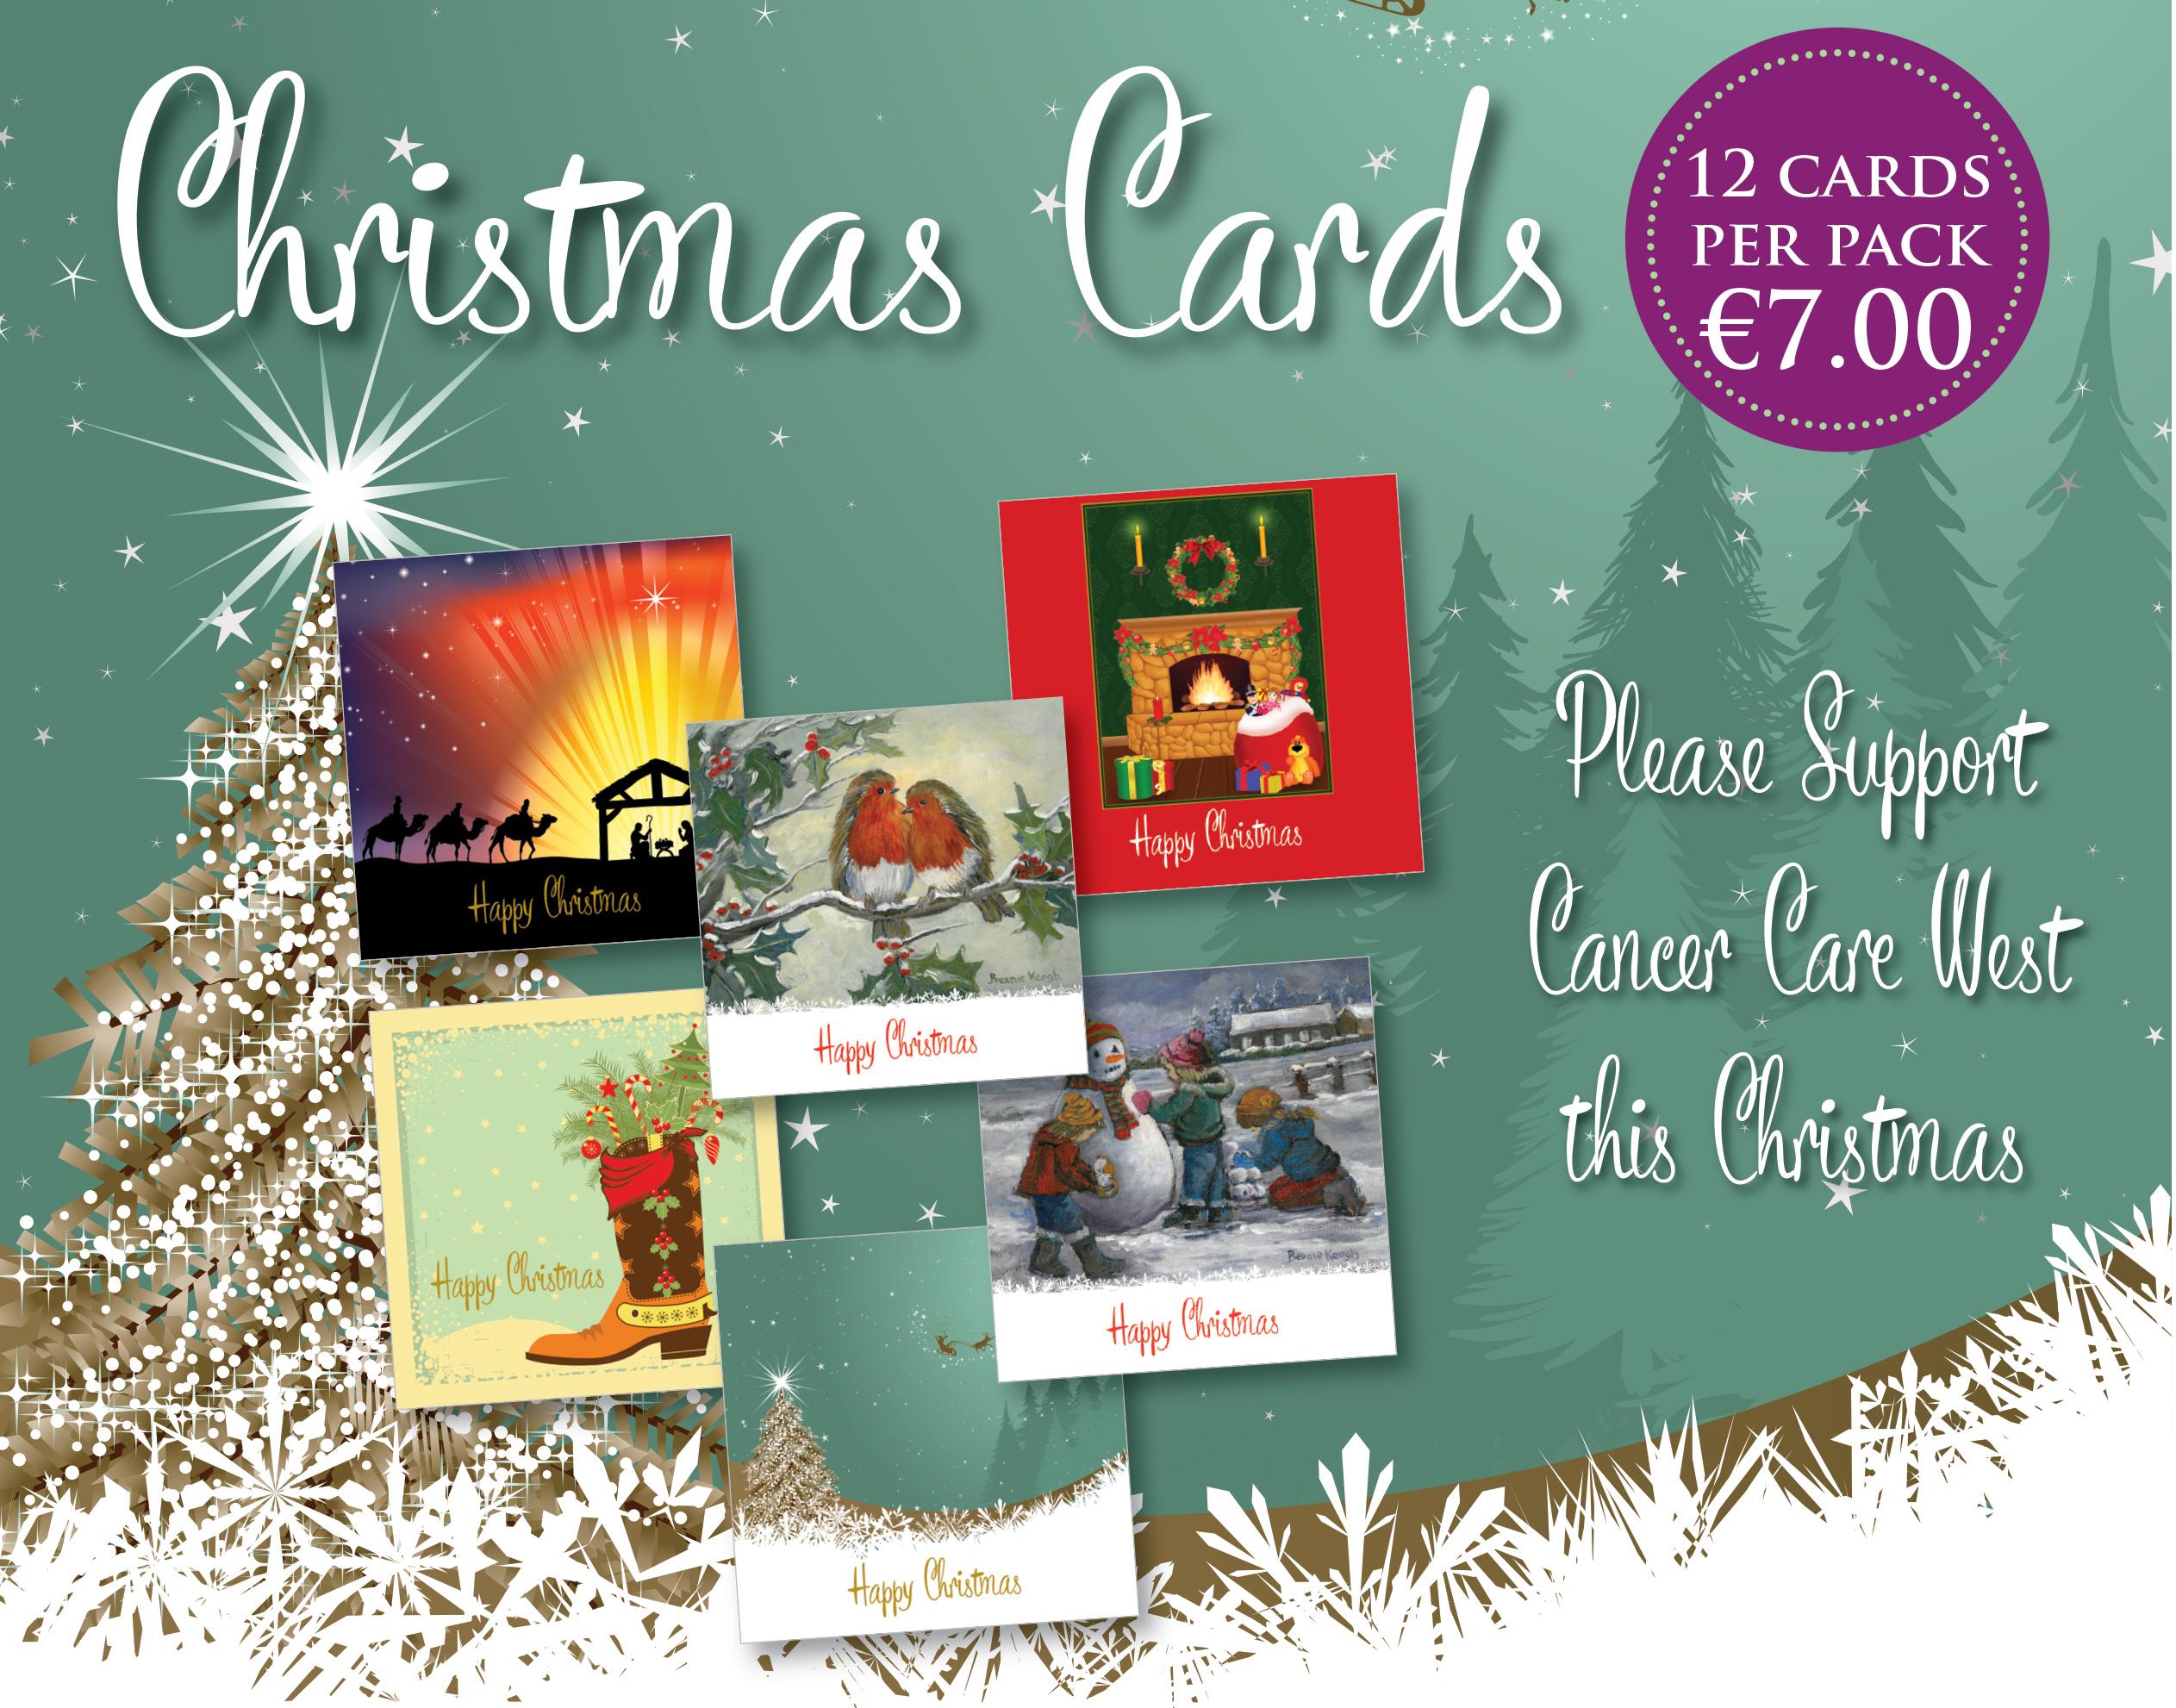 Cancer Care West Christmas Card A4 Qp21886 Cancer Care West